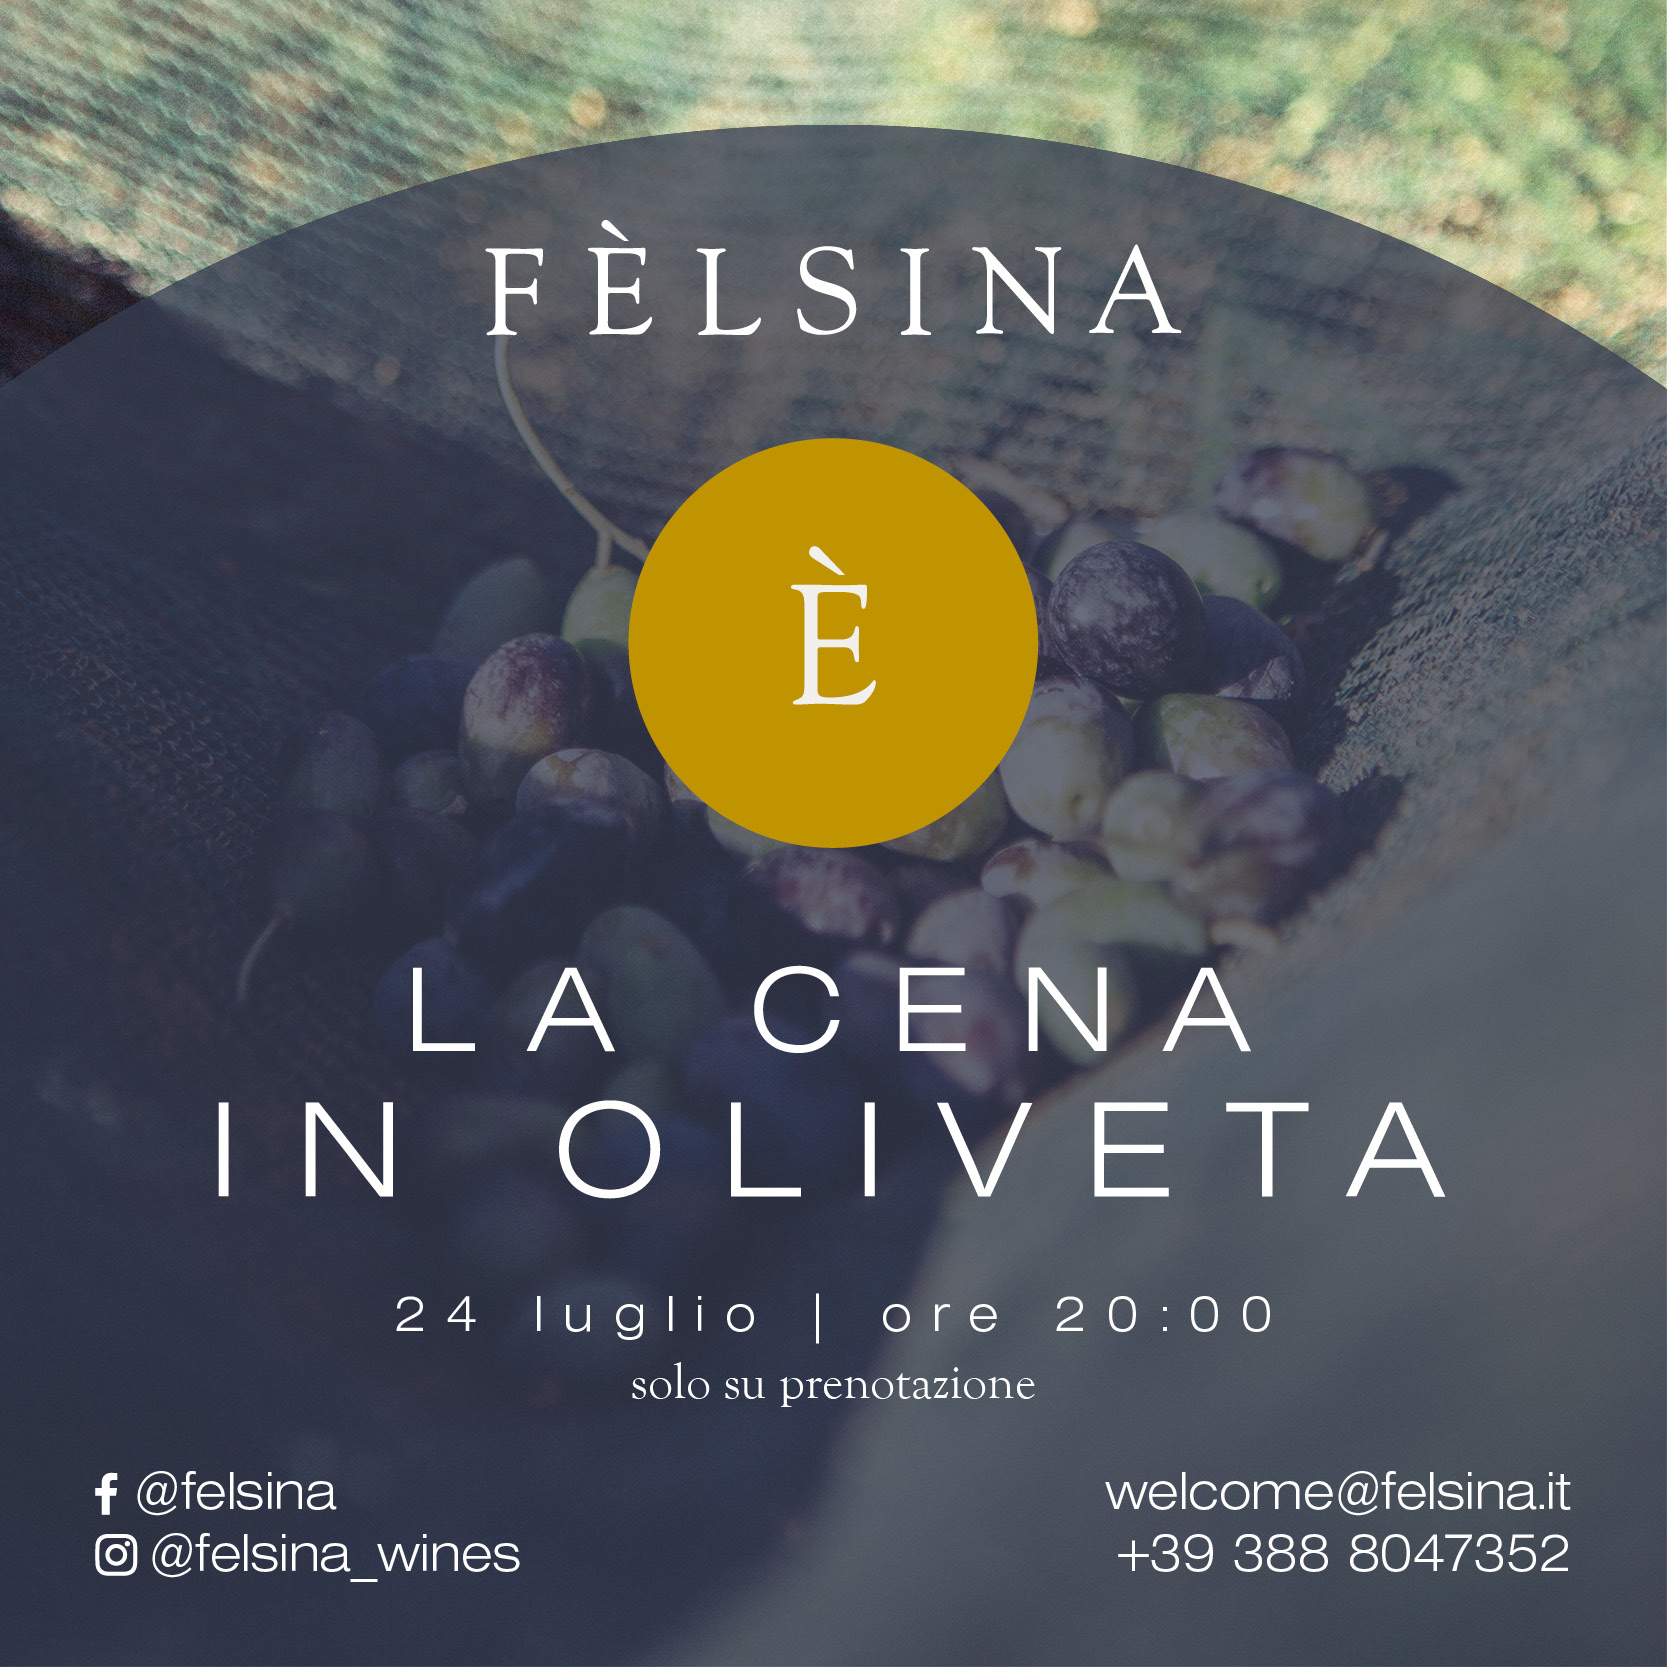 felsina_post_2021_eventi5